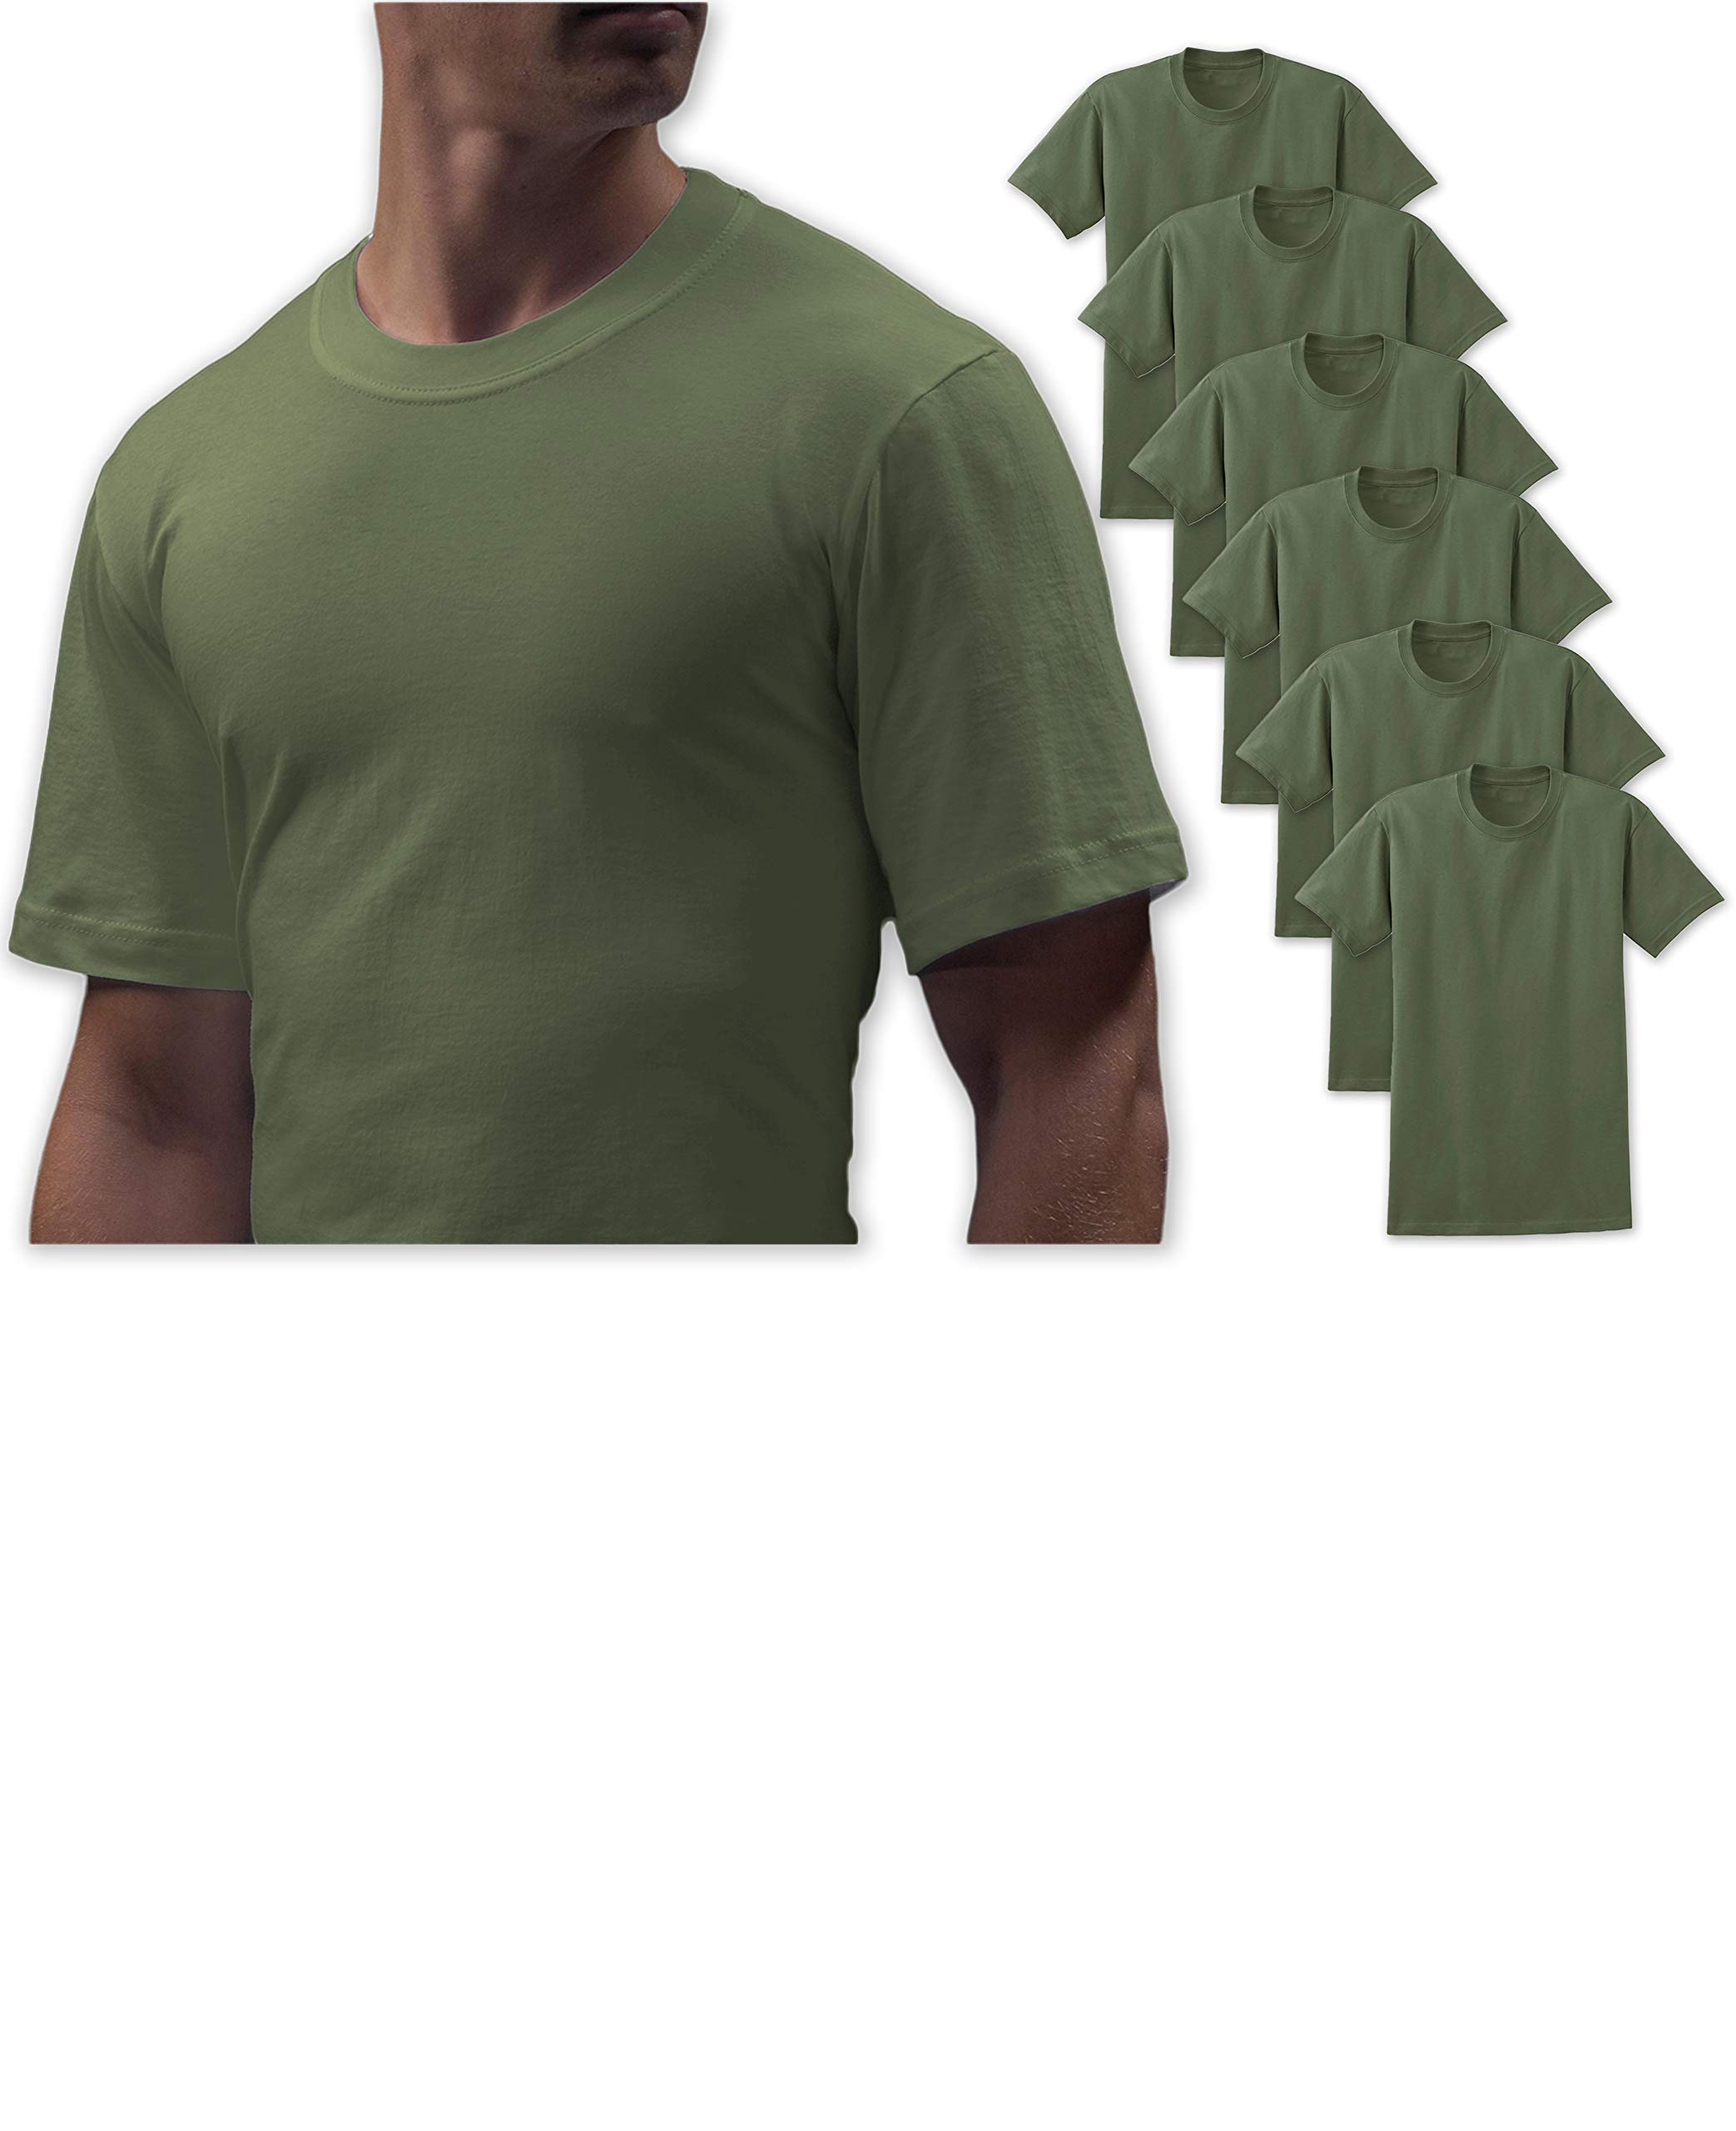 Andrew Scott Big Man 6 Pack Military Green Cotton Crew Neck Short Sleeve T Shirts (5X-Large, 6 Pack- Military Khaki Green)